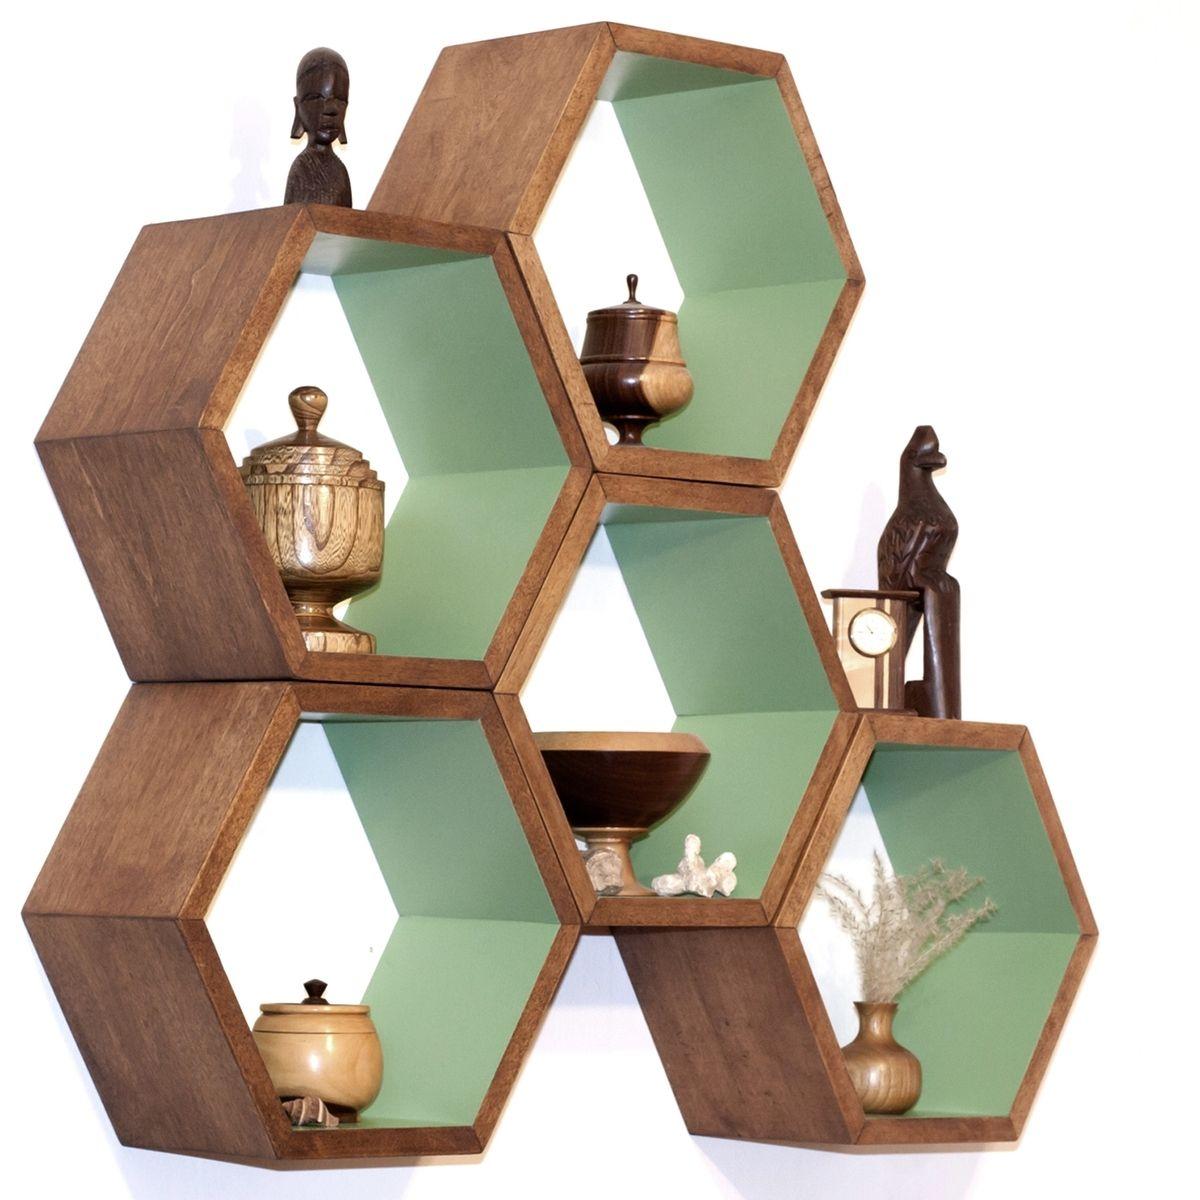 custom made modern shelving  hexagon arrangements by  - custom made modern shelving  hexagon arrangements